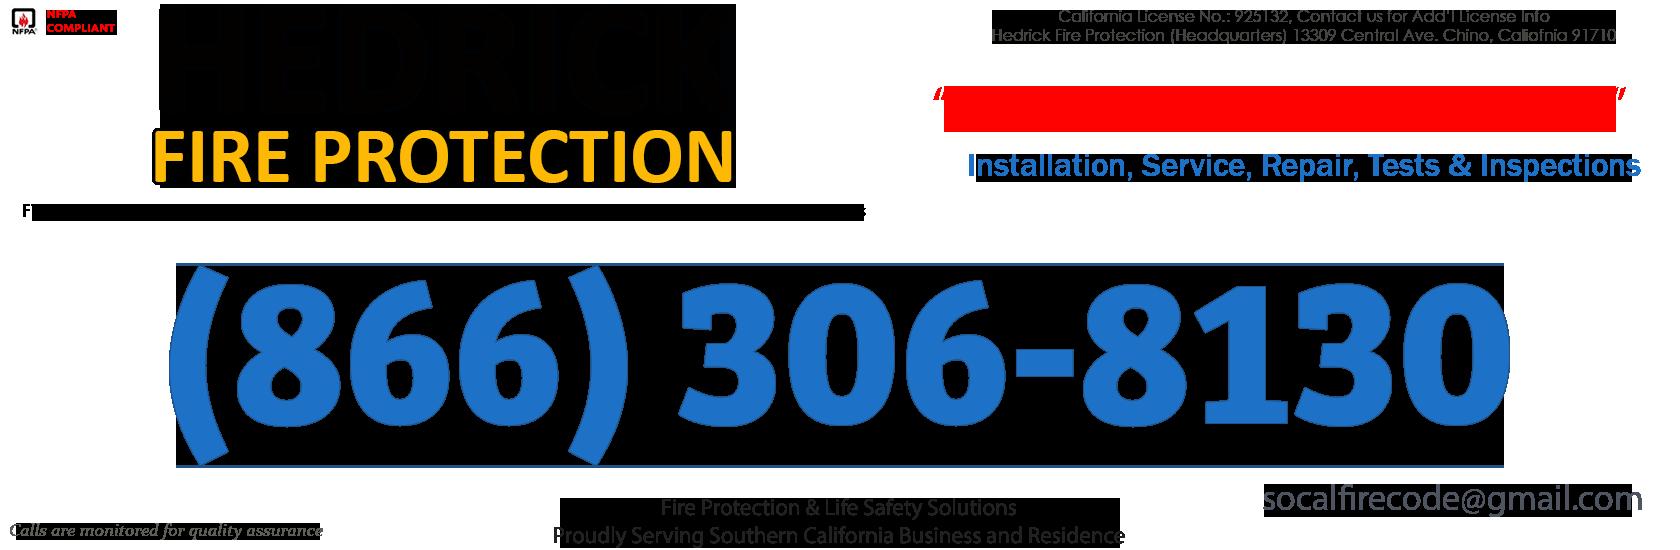 Carpinteria, California Fire Sprinkler Service Company